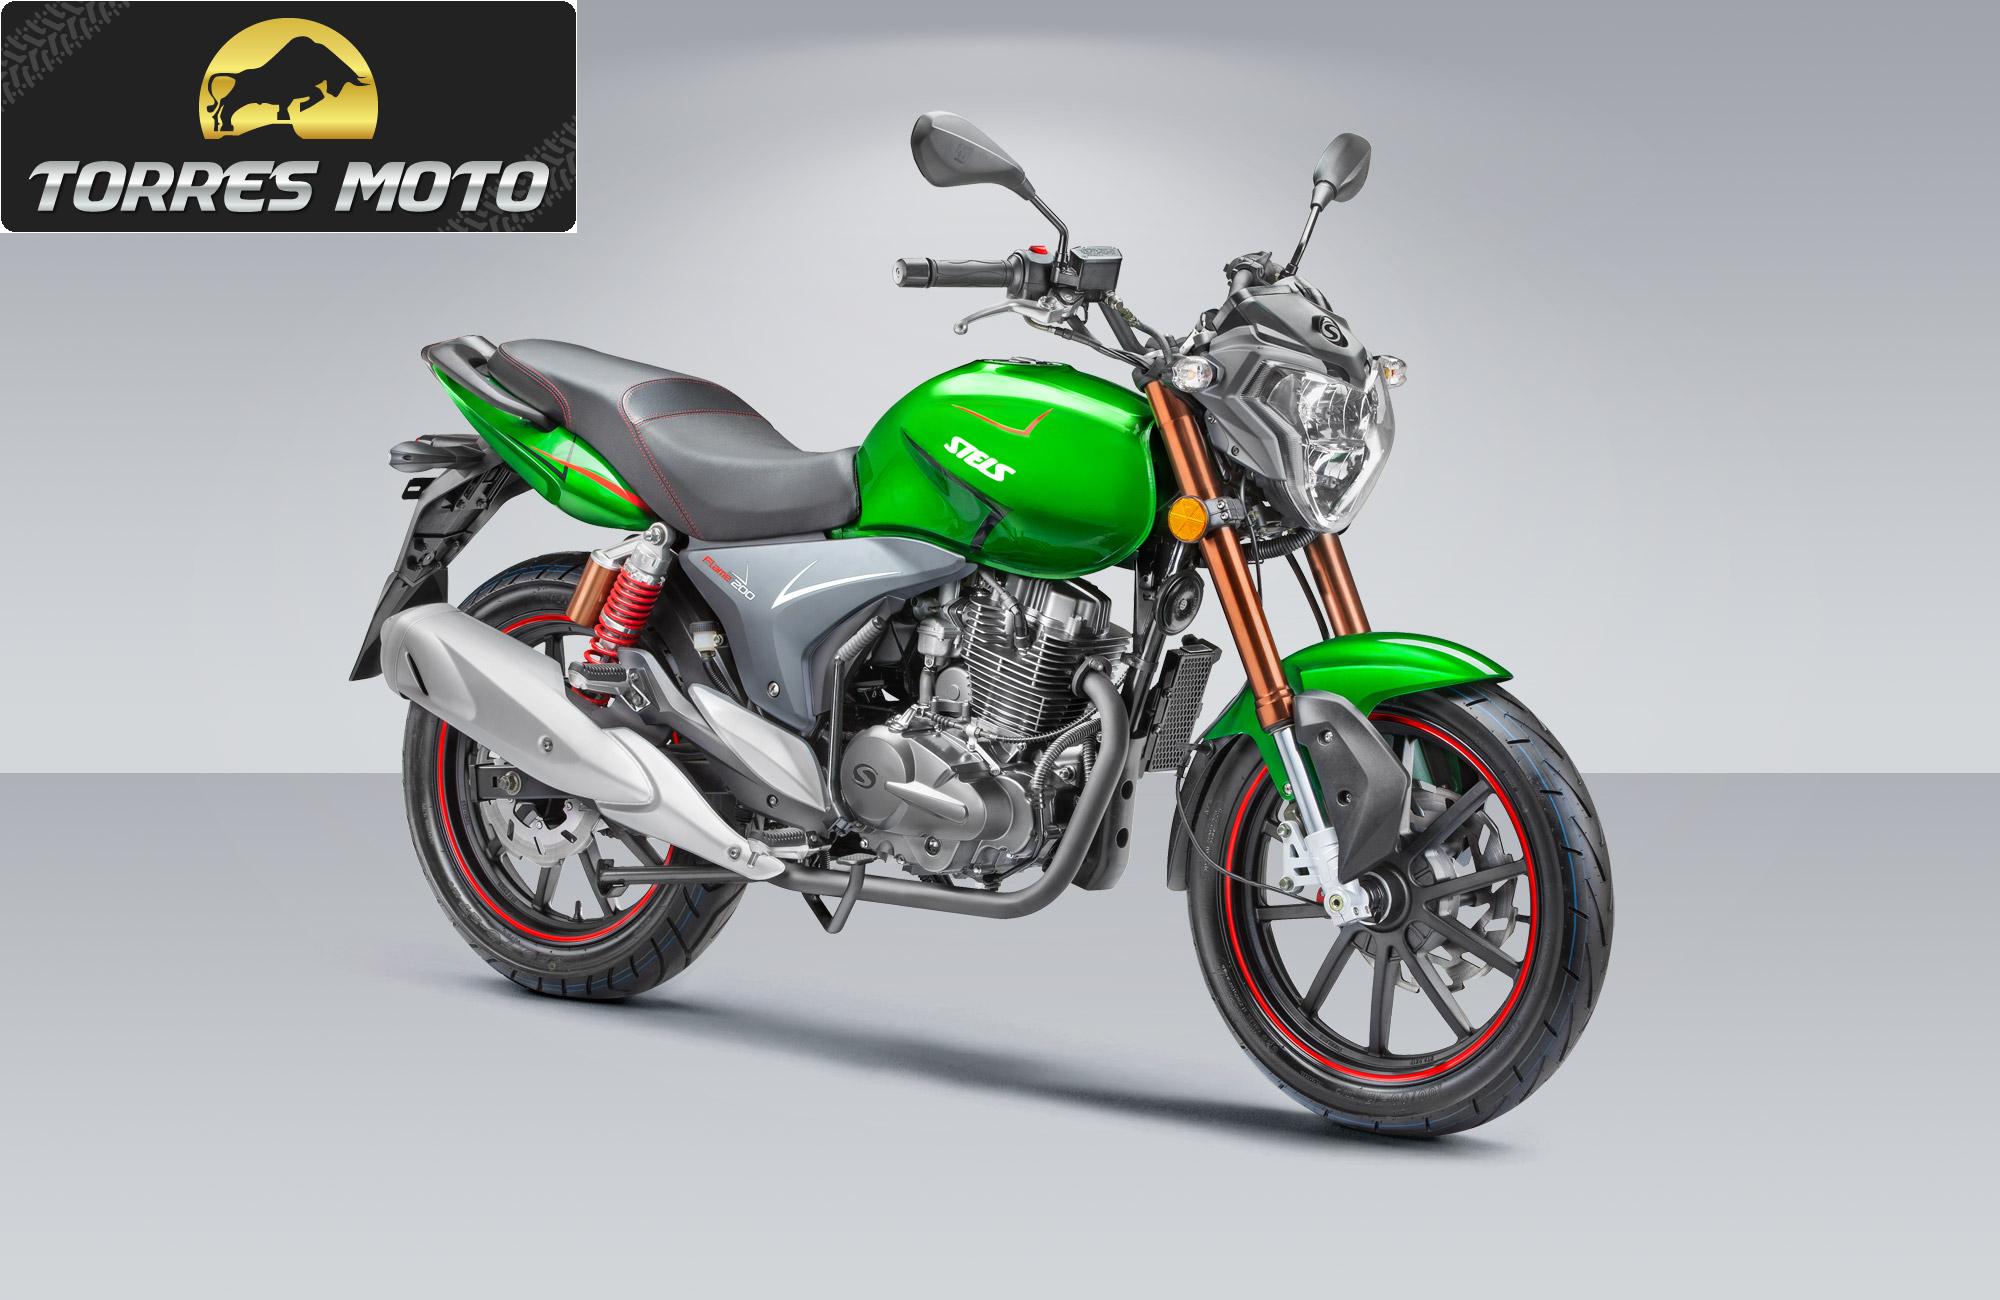 Продается мотоцикл STELS FLAME 200